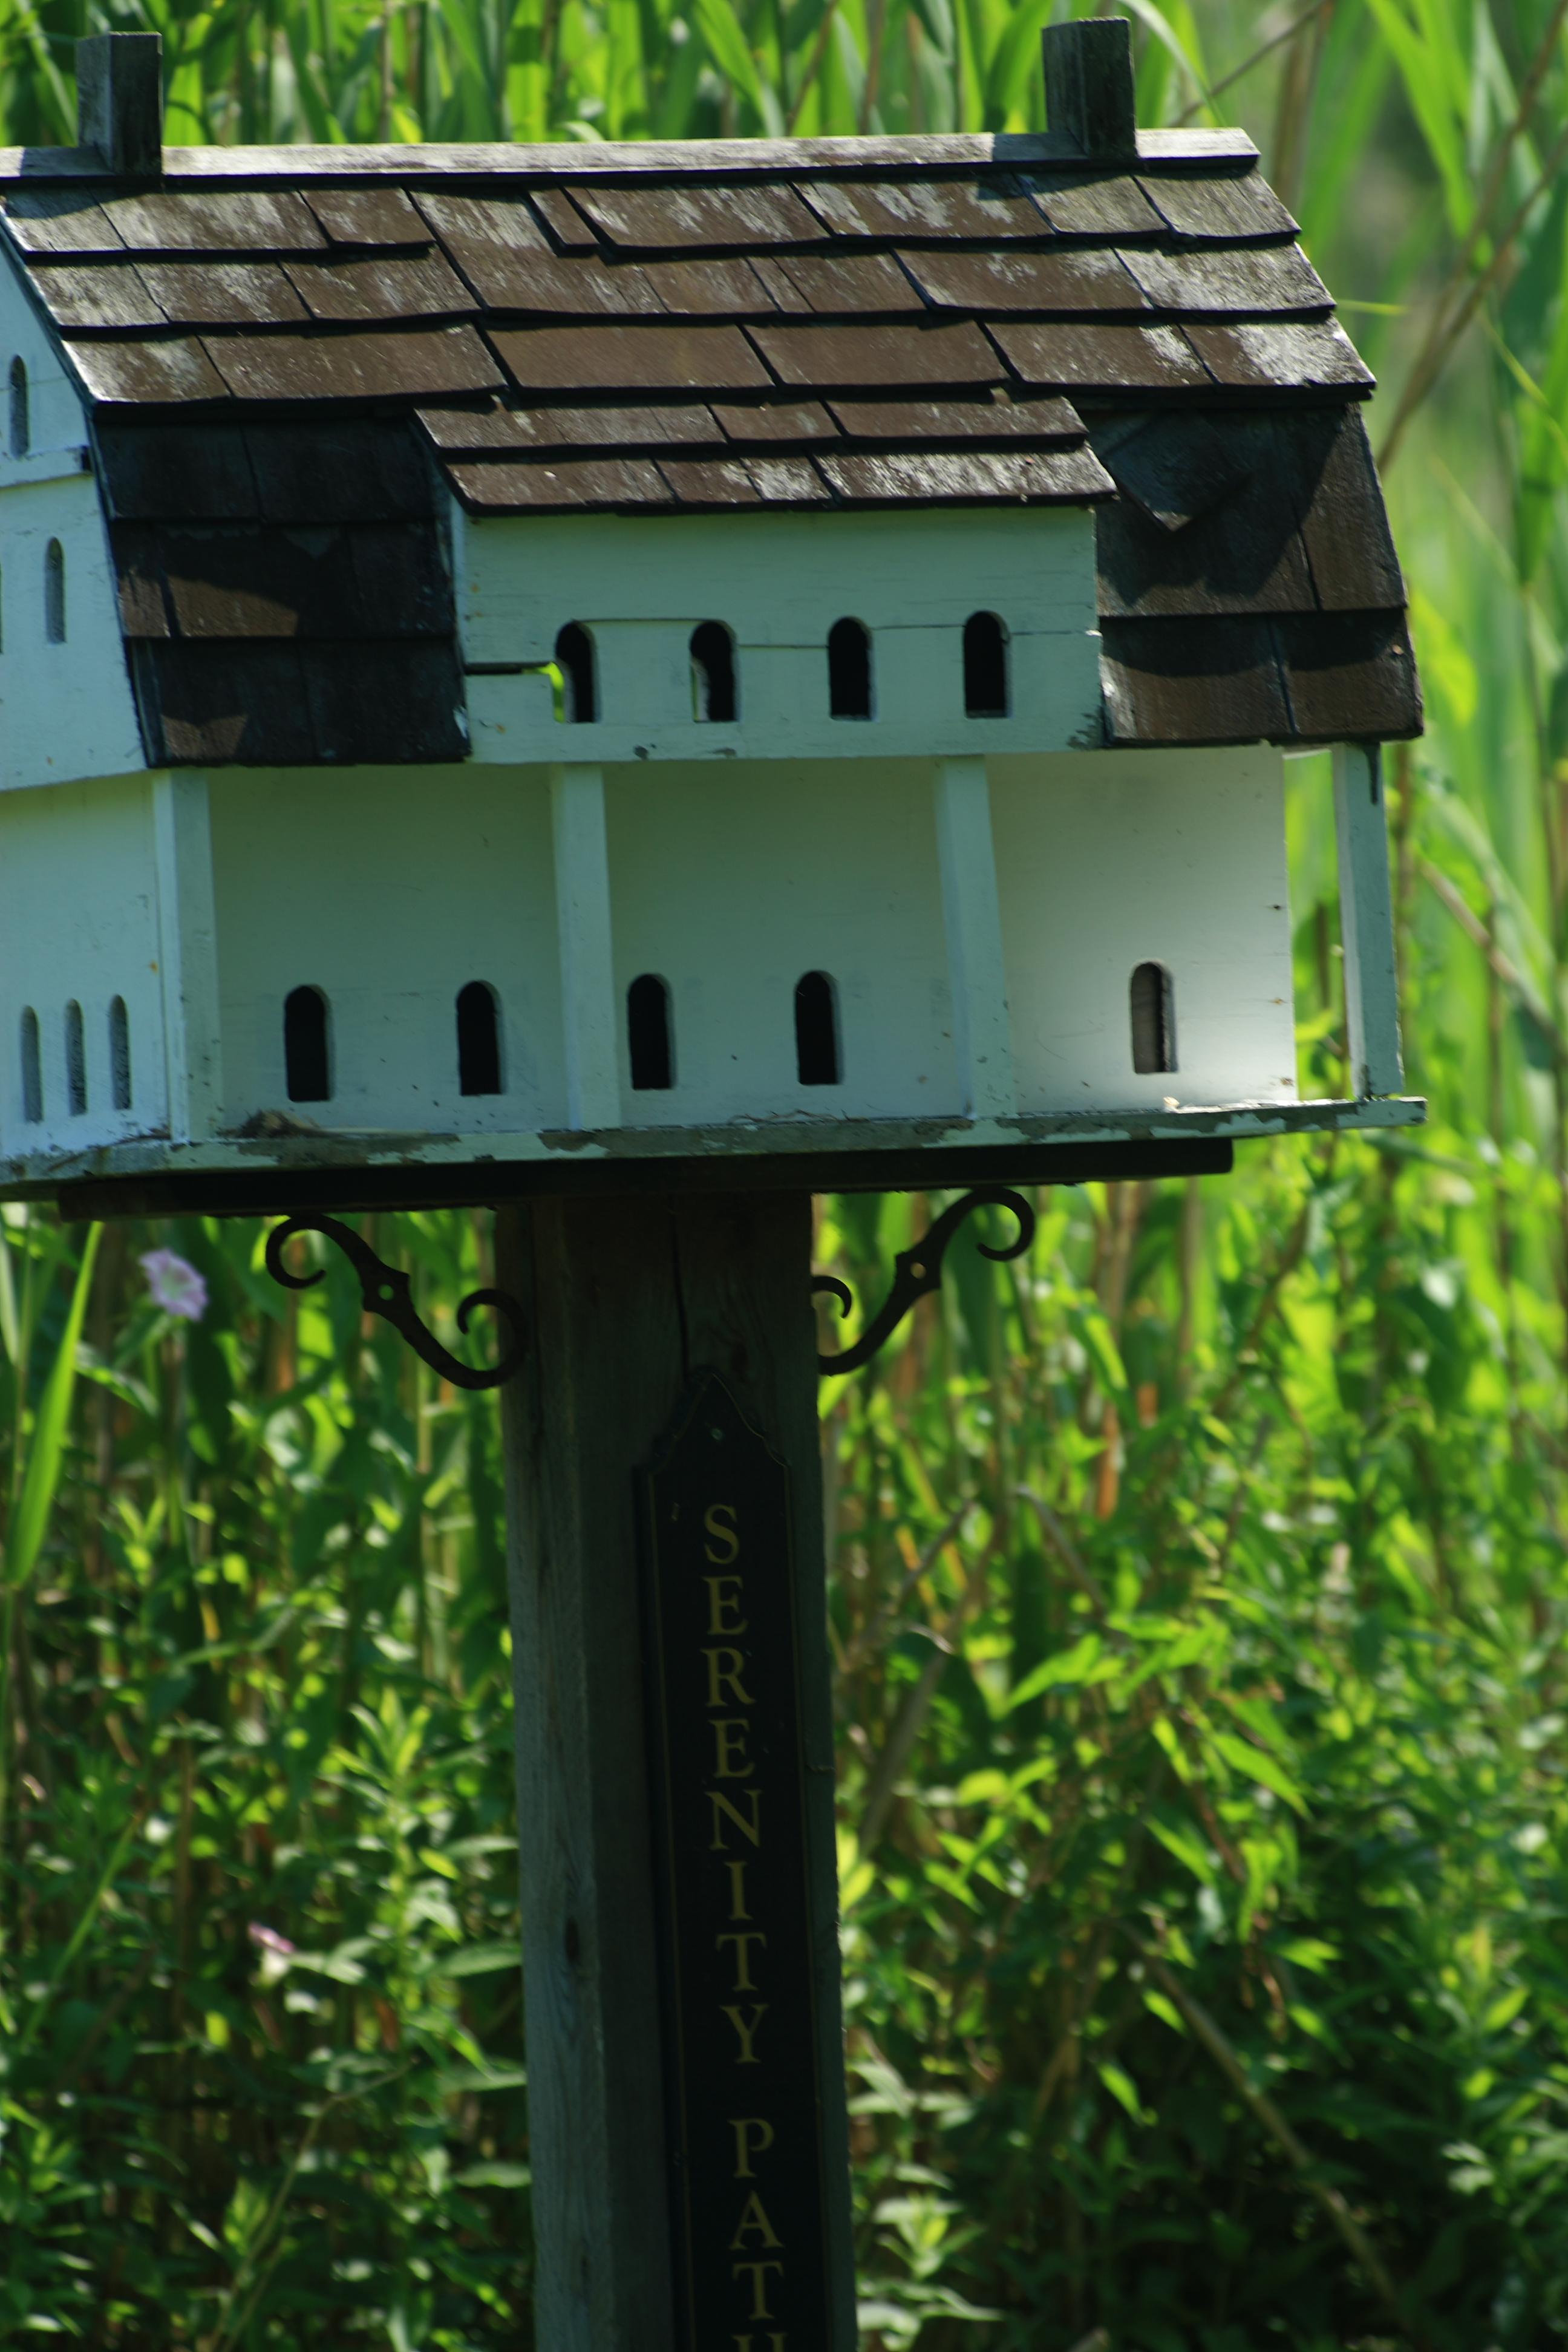 birdhouse hotel plans